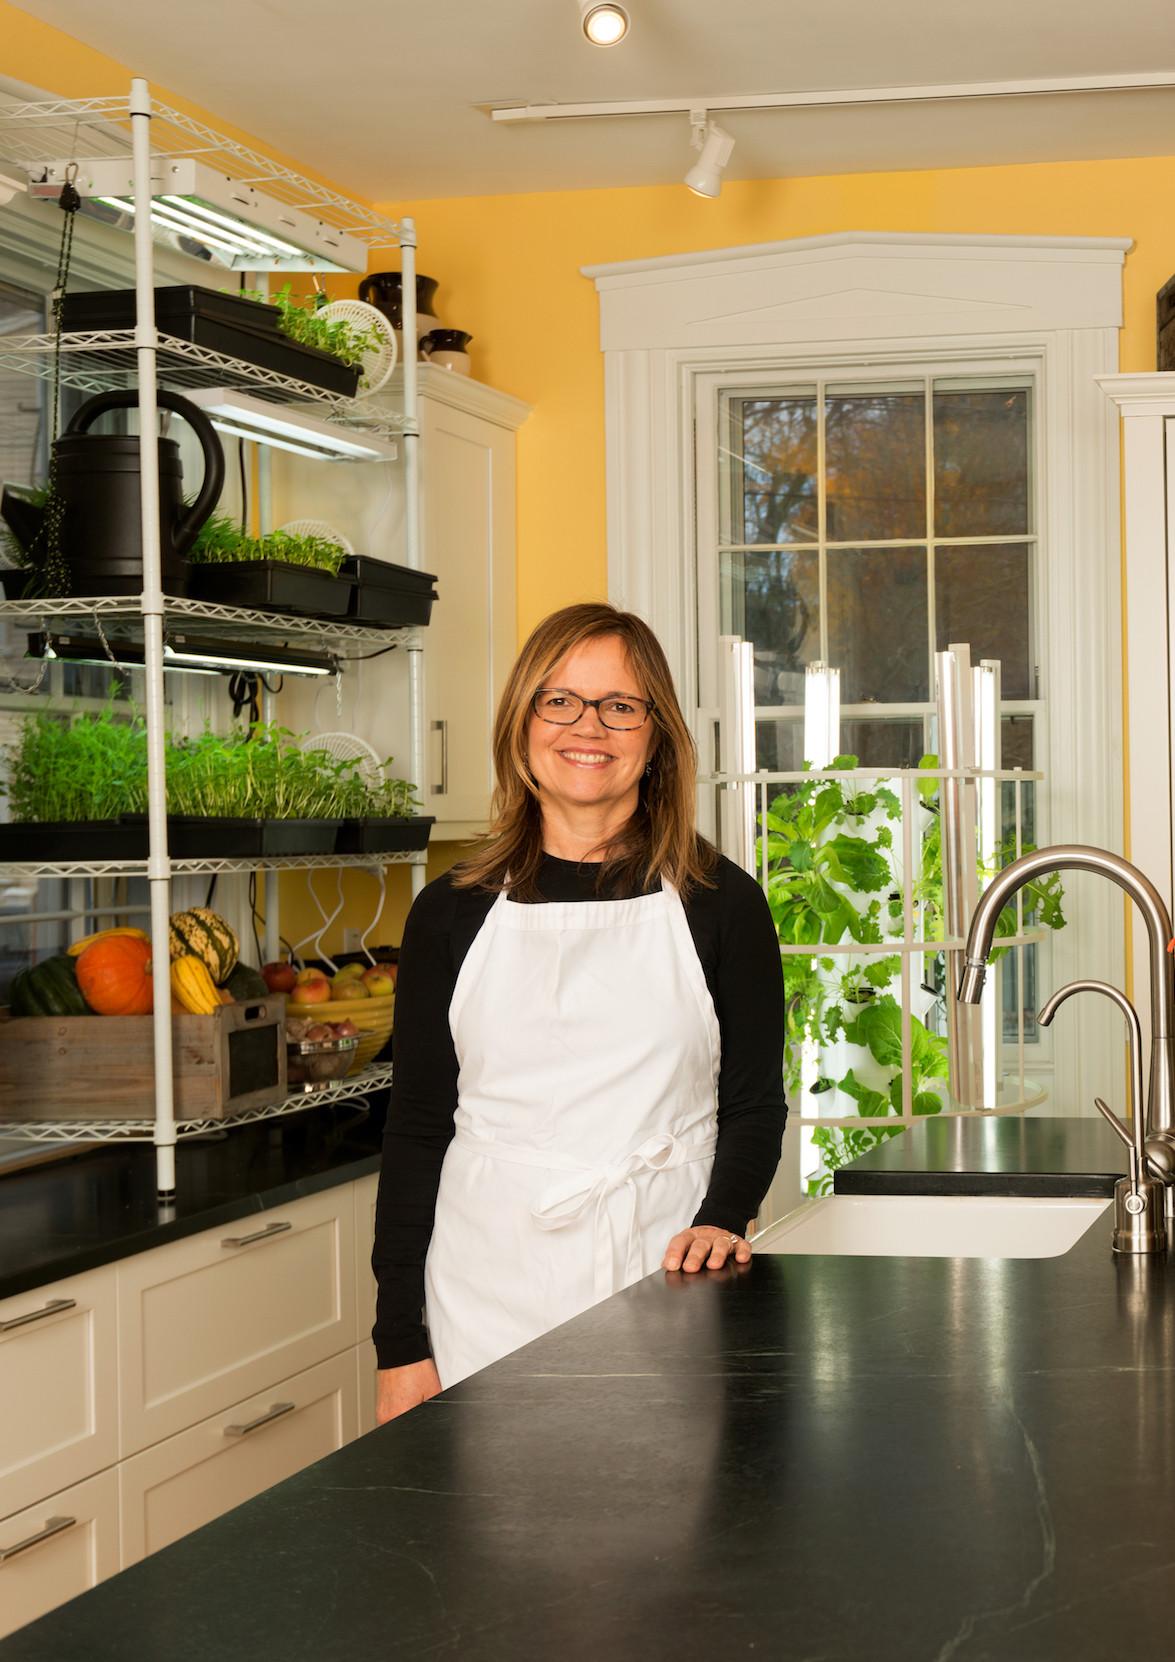 Diane Deguzman Pyle Kitchen Plant Based Vegetarian